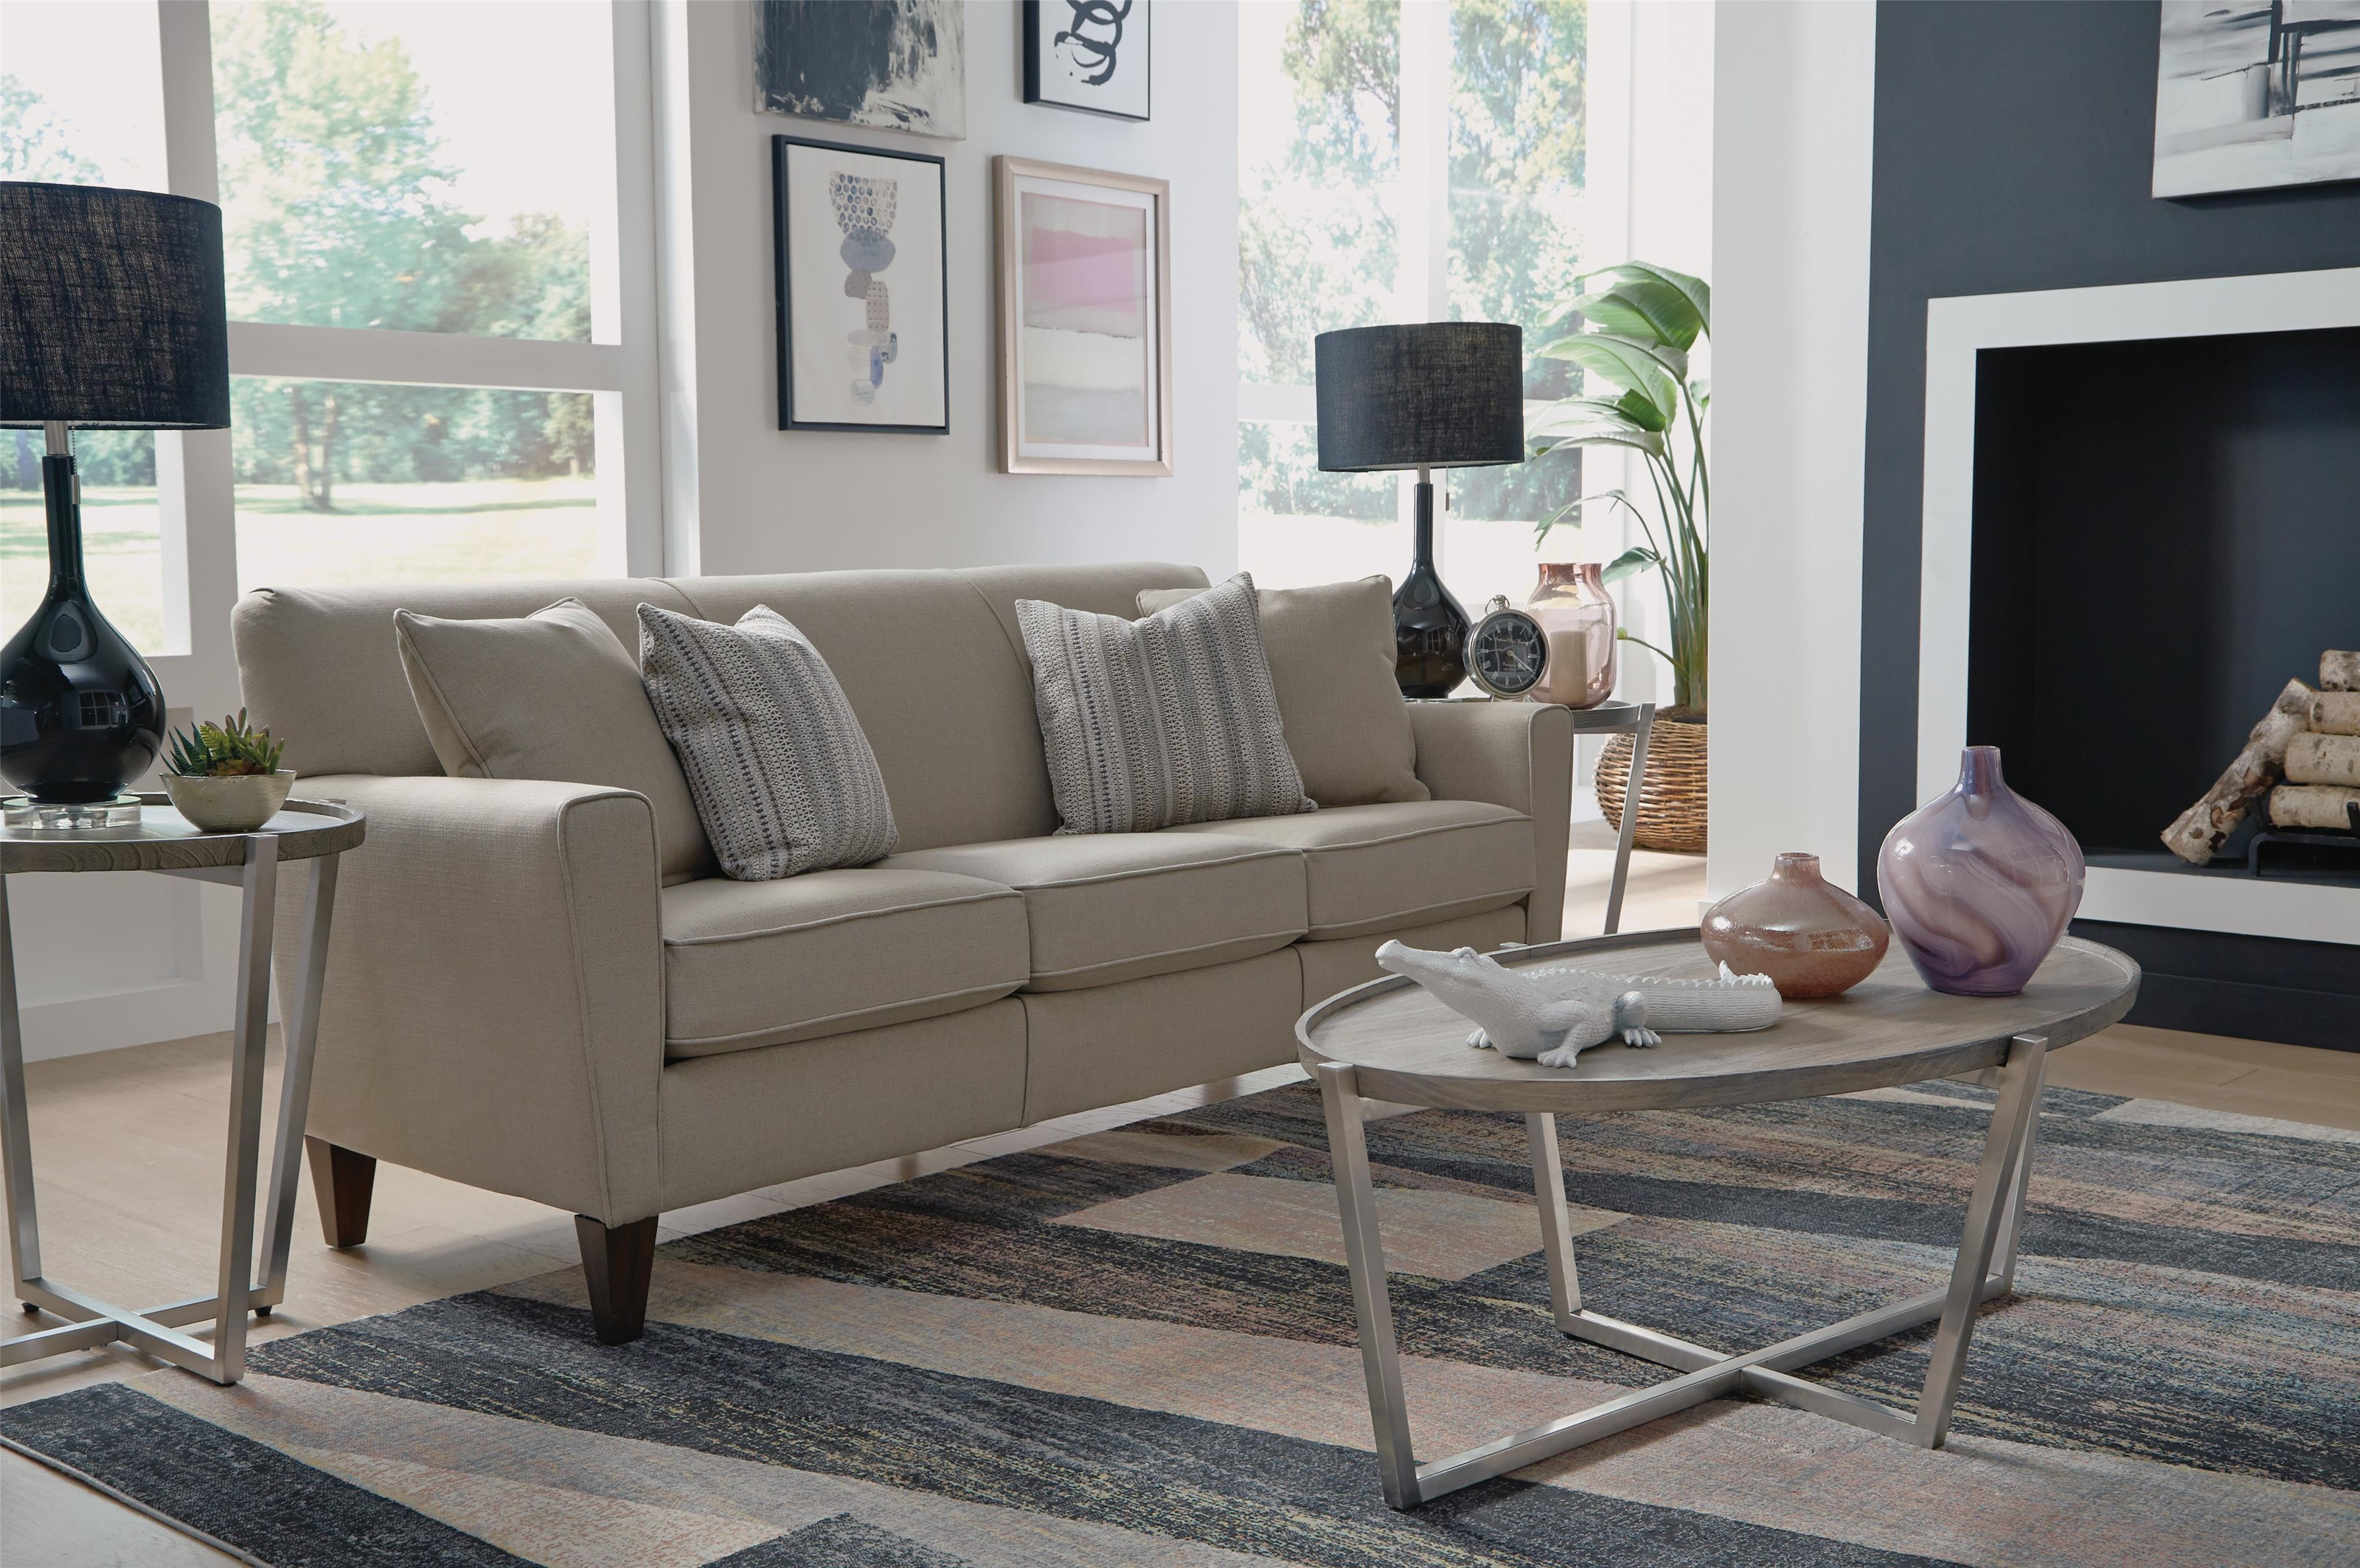 Bella Living Room Group Flexsteel Bella by Flexsteel at Crowley Furniture & Mattress